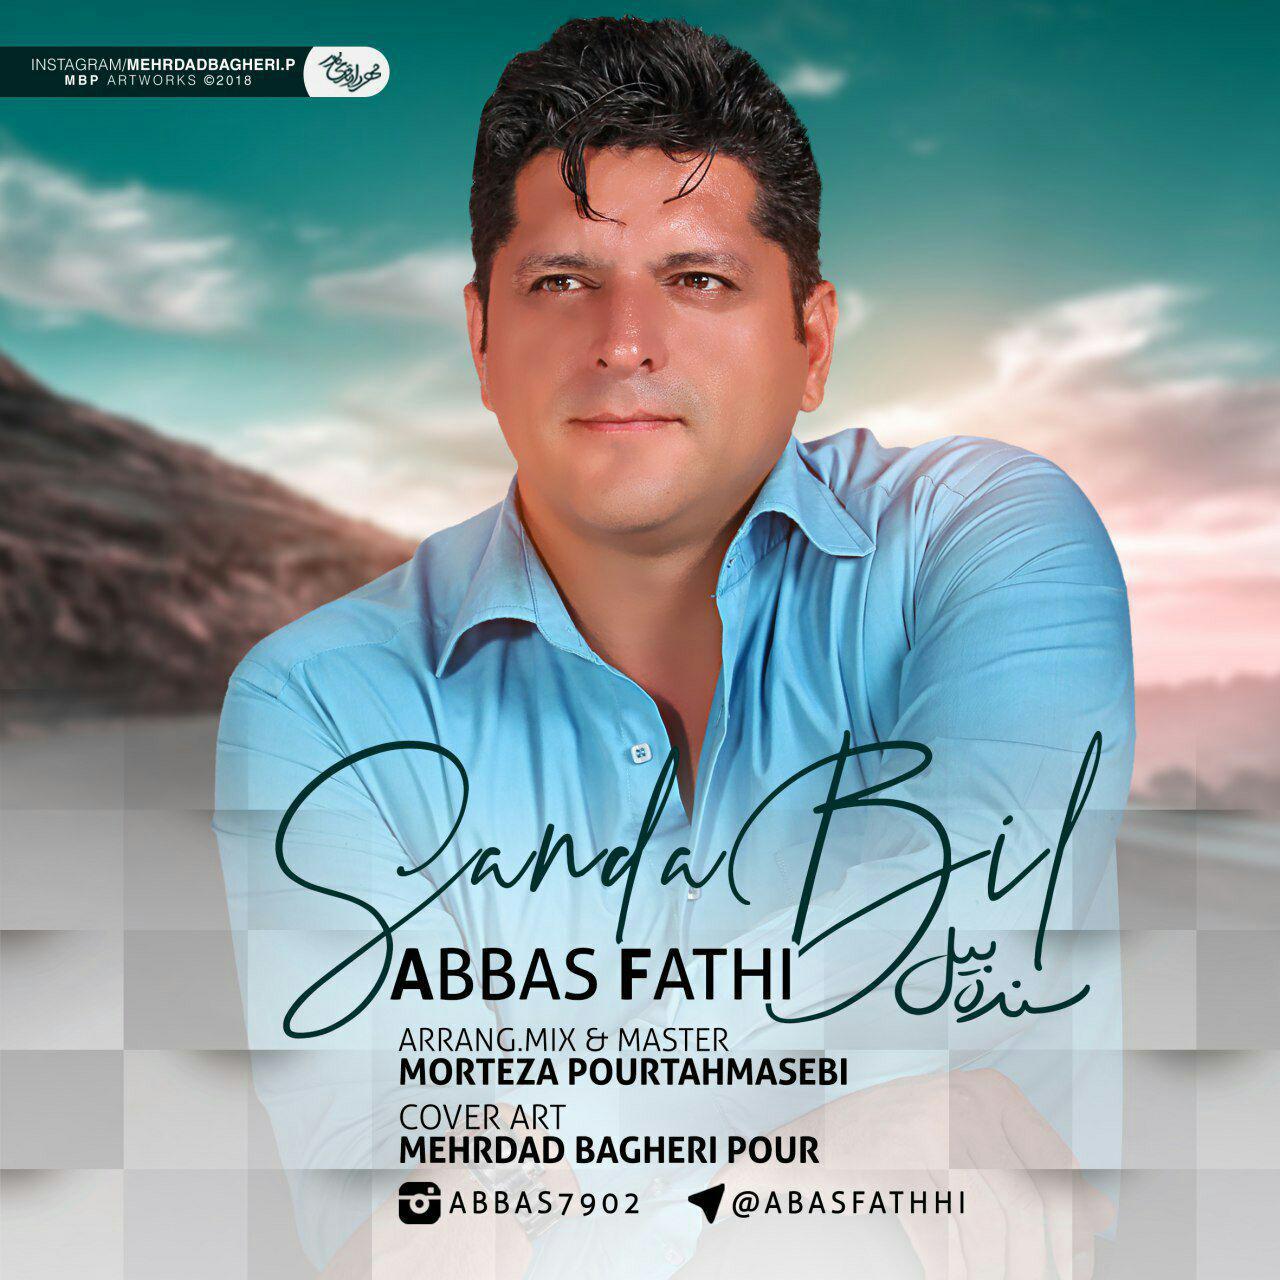 Abbas Fathi - Sanda Bil